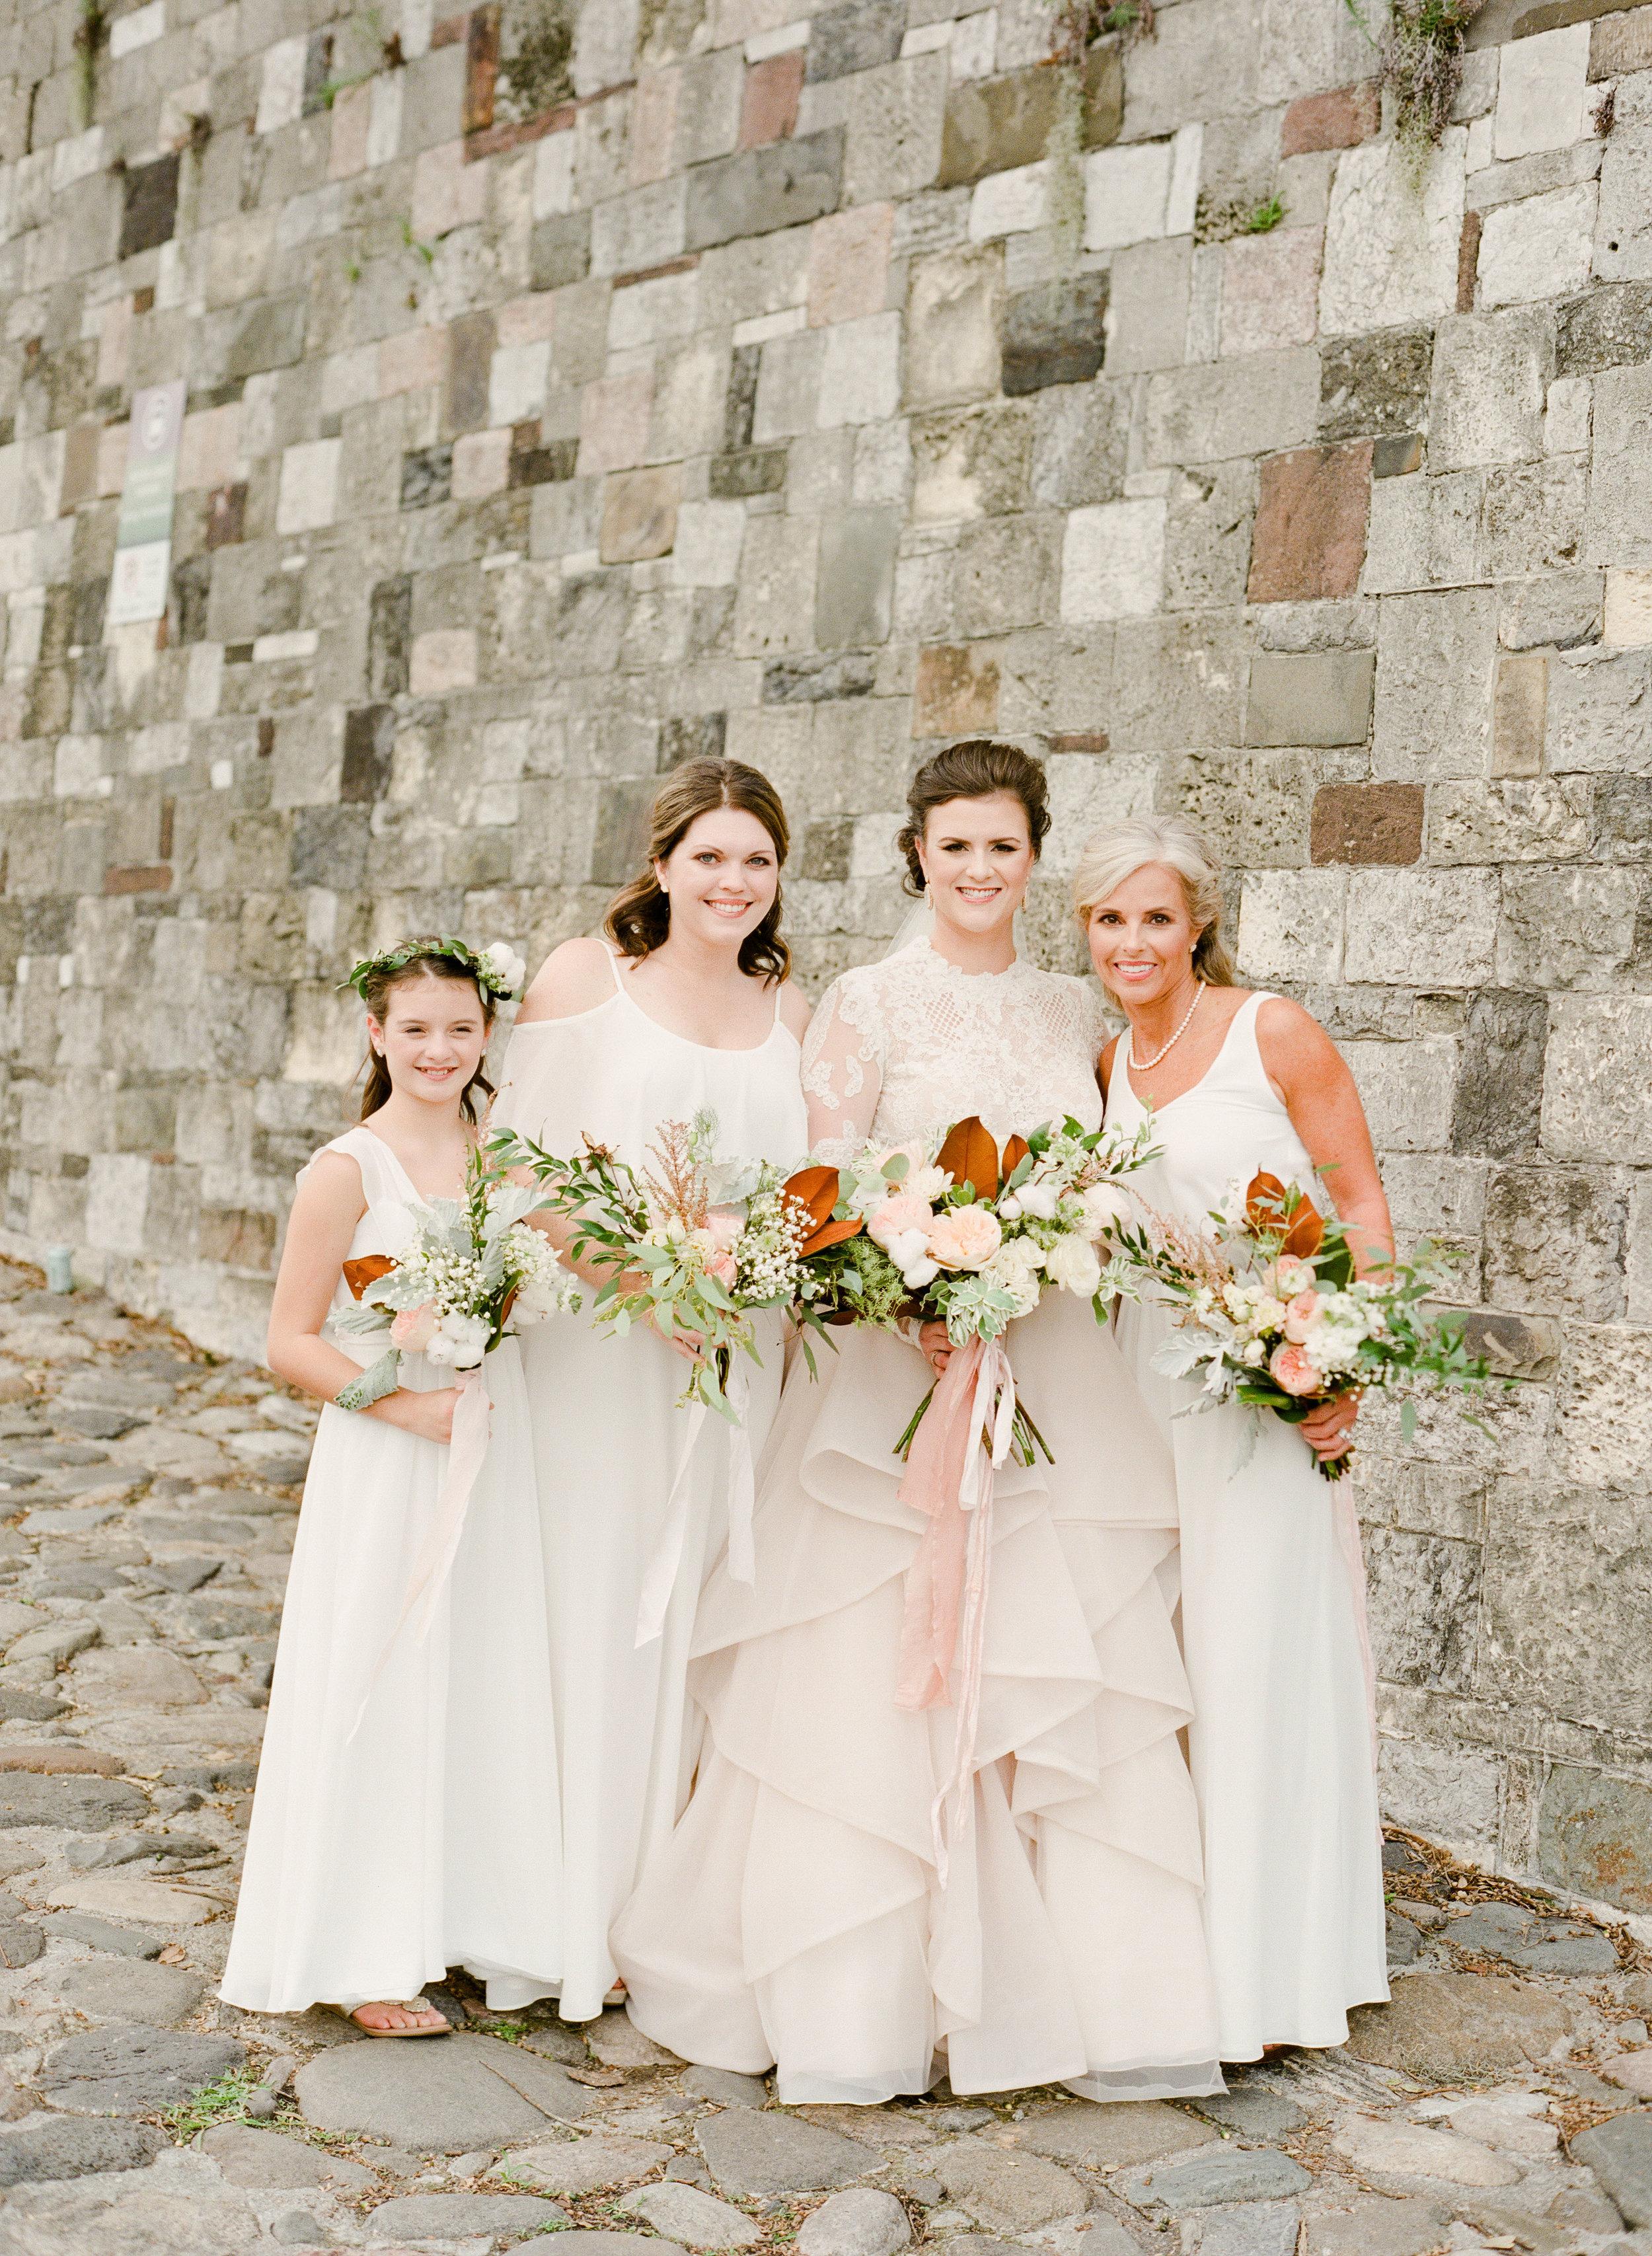 savannah-cha-bella-wedding-23.jpg